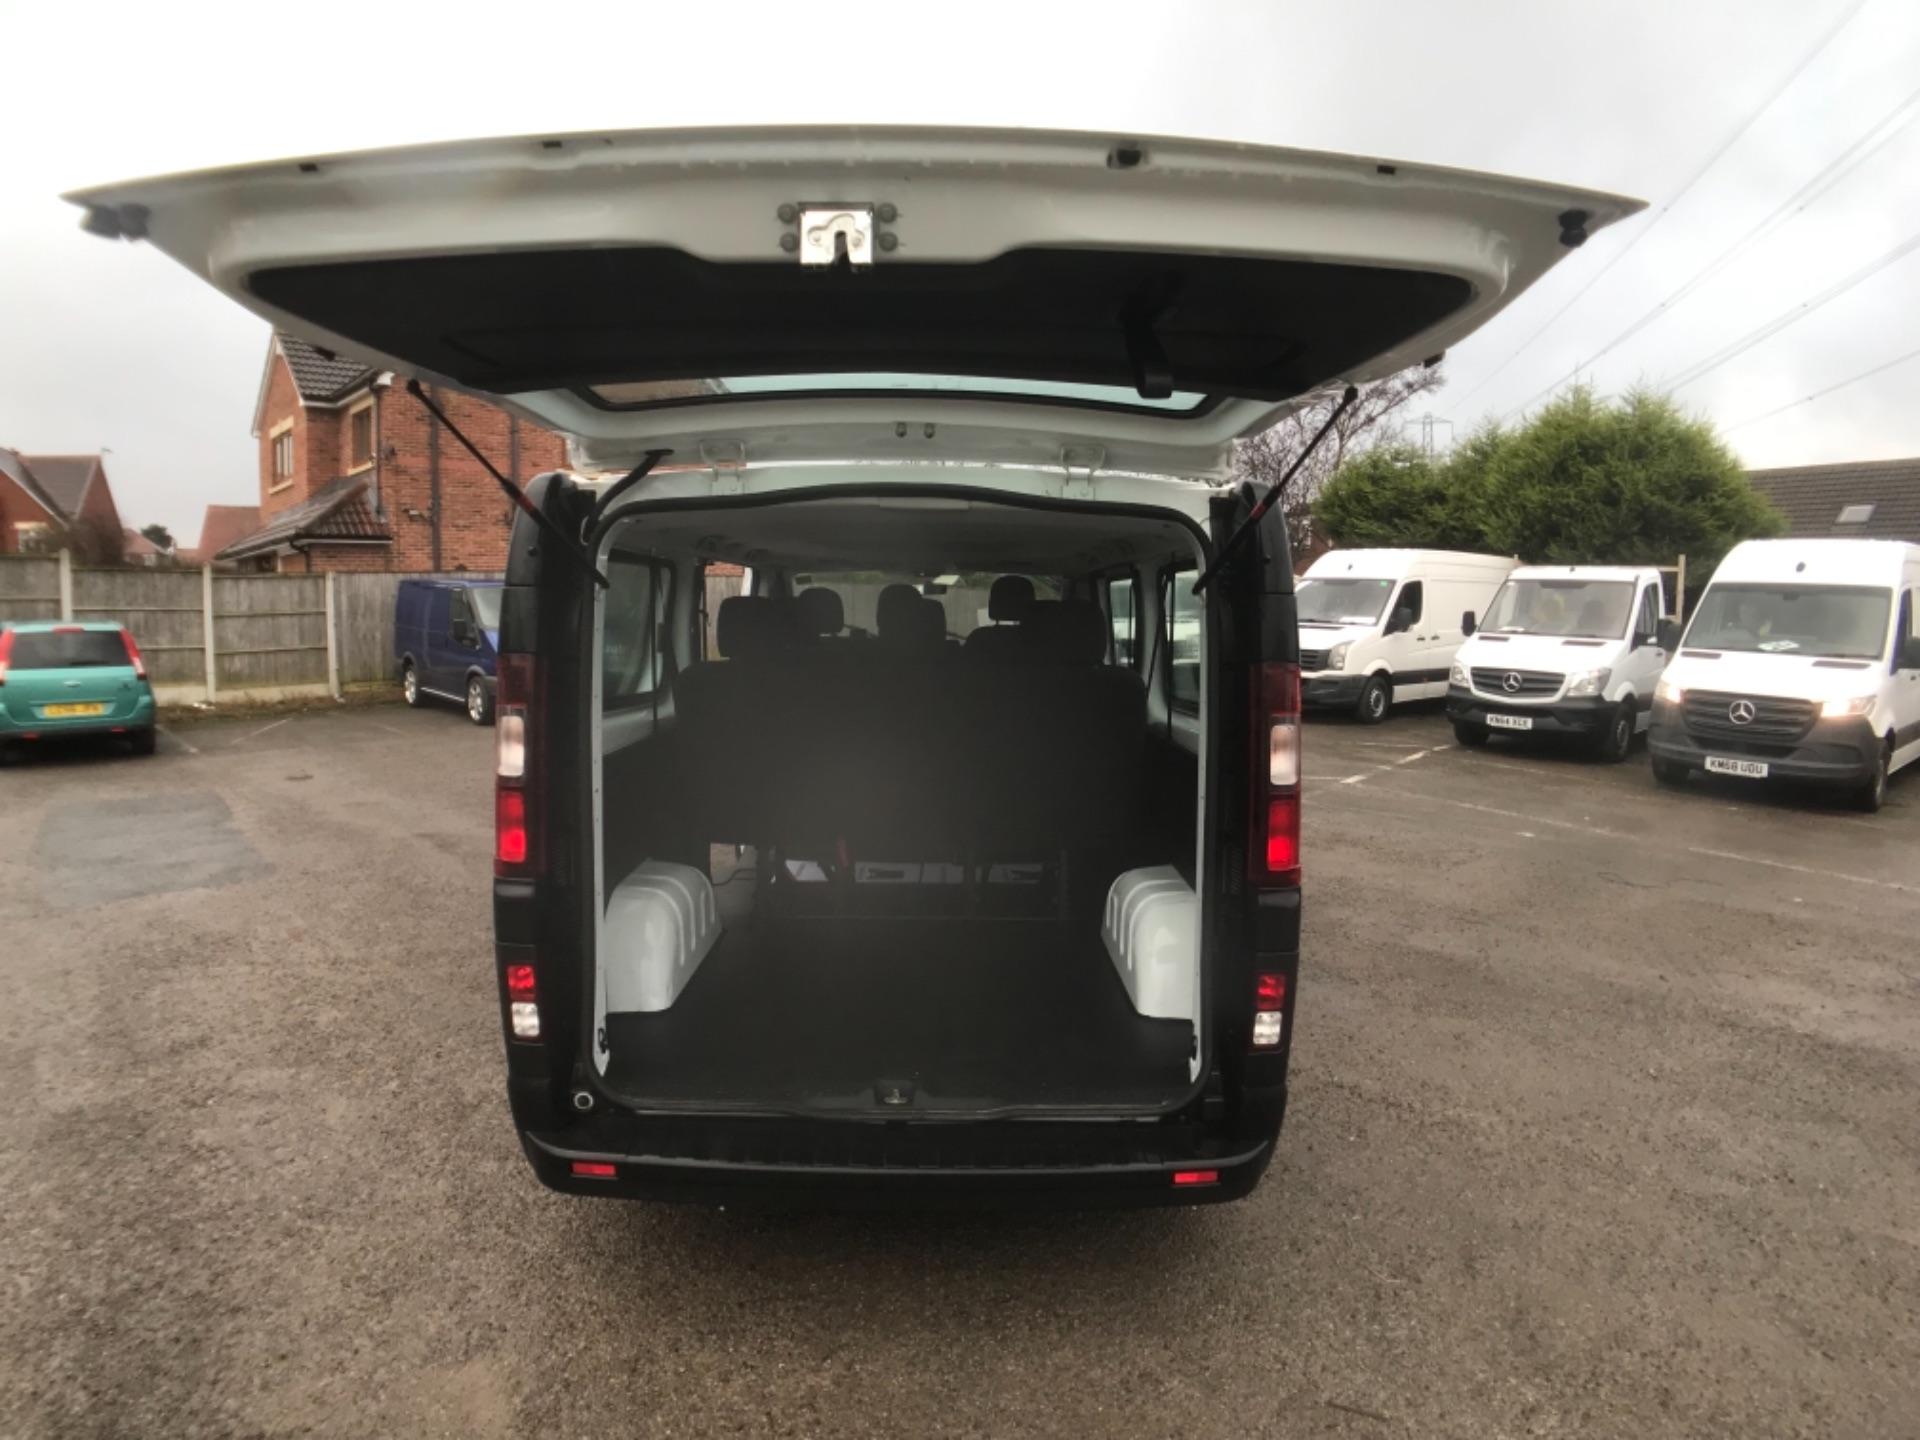 2017 Vauxhall Vivaro 2900 1.6Cdti Biturbo 125Ps H1 Combi 9 Seat Euro 6 (DY17UGF) Image 24